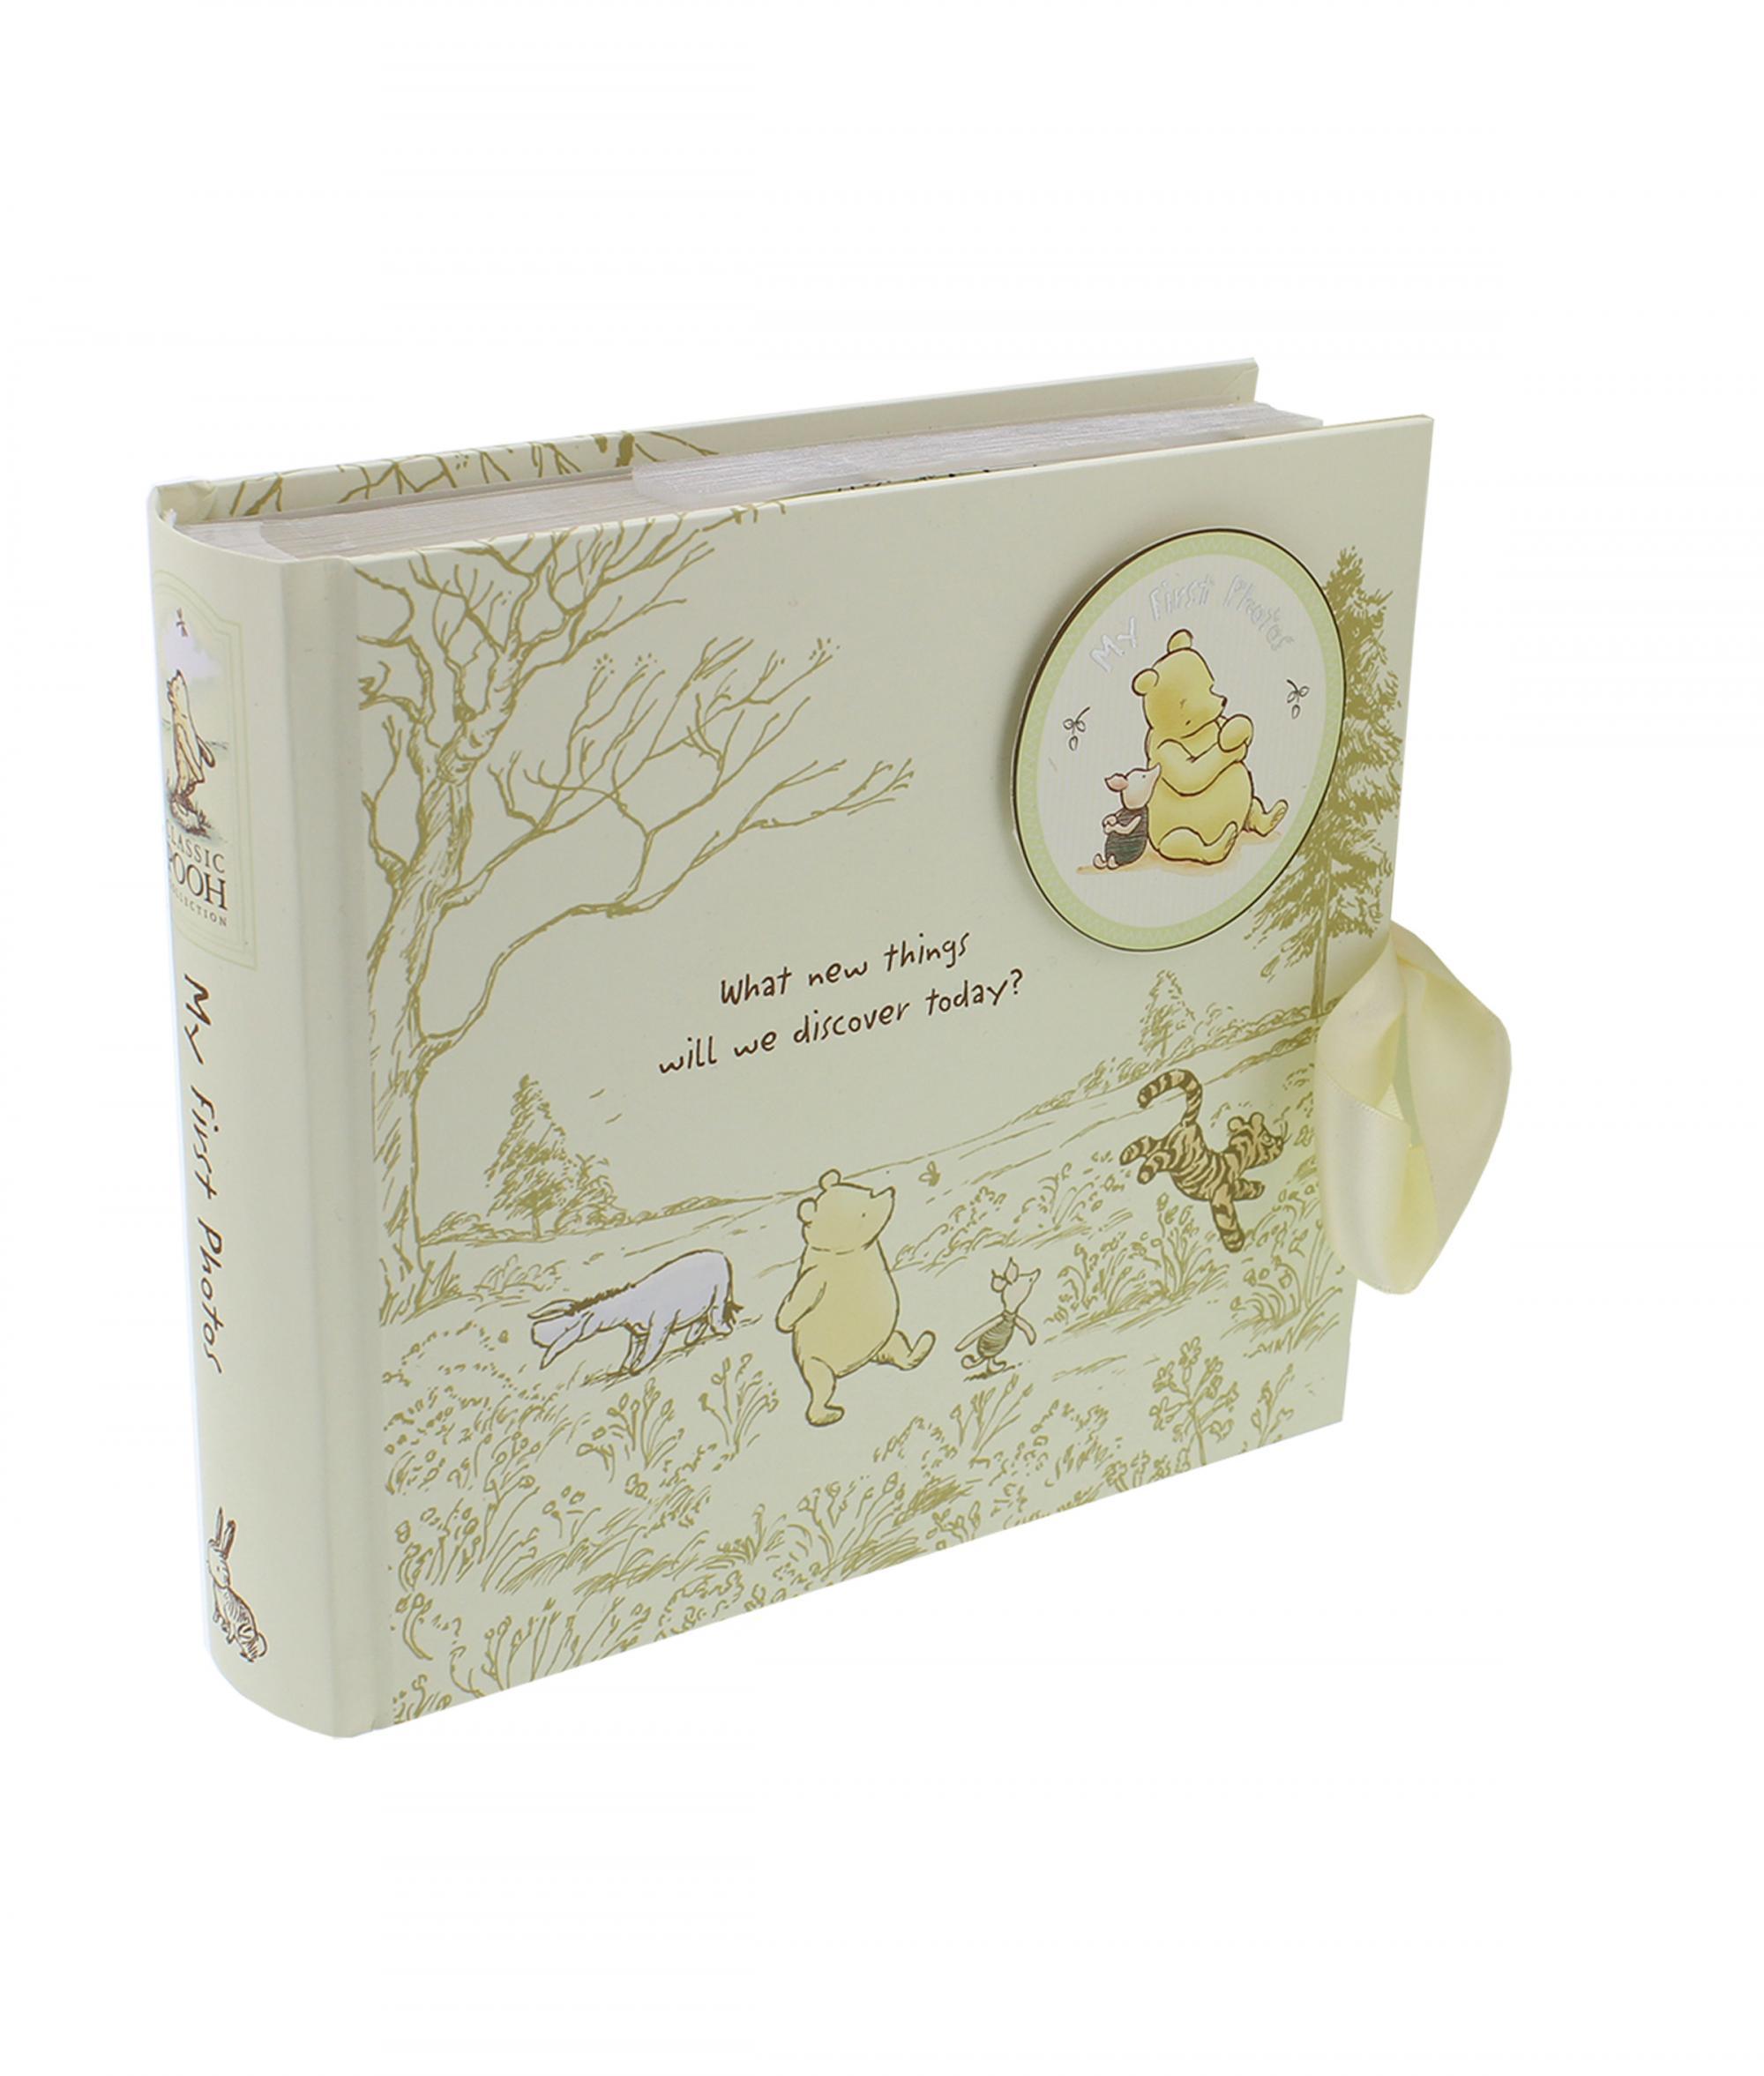 Disney Baby Gifts Uk : Disney classic pooh heritage photo album